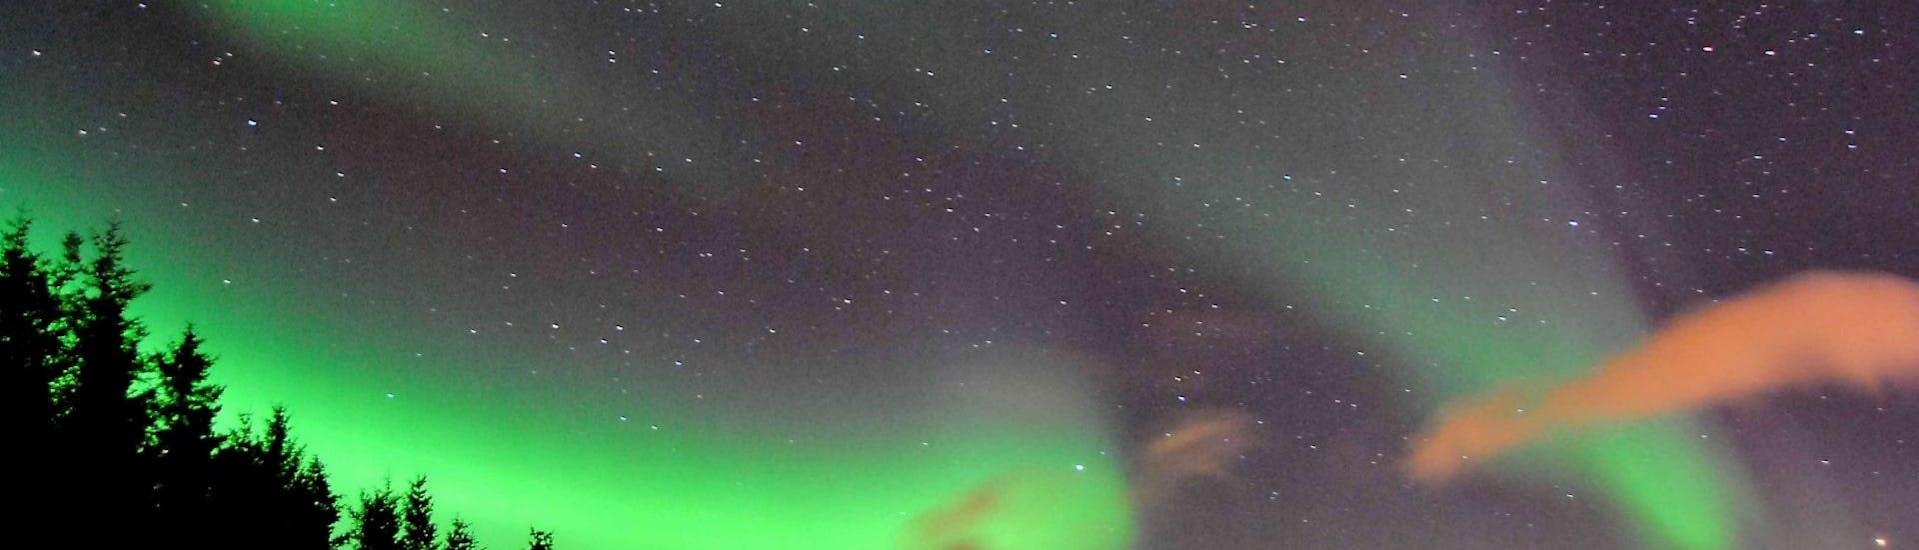 "Landscape of Lofoten with the Aurora during Kayak Tour ""Northern Lights"" in Lofoten organized by Northern Explorer."